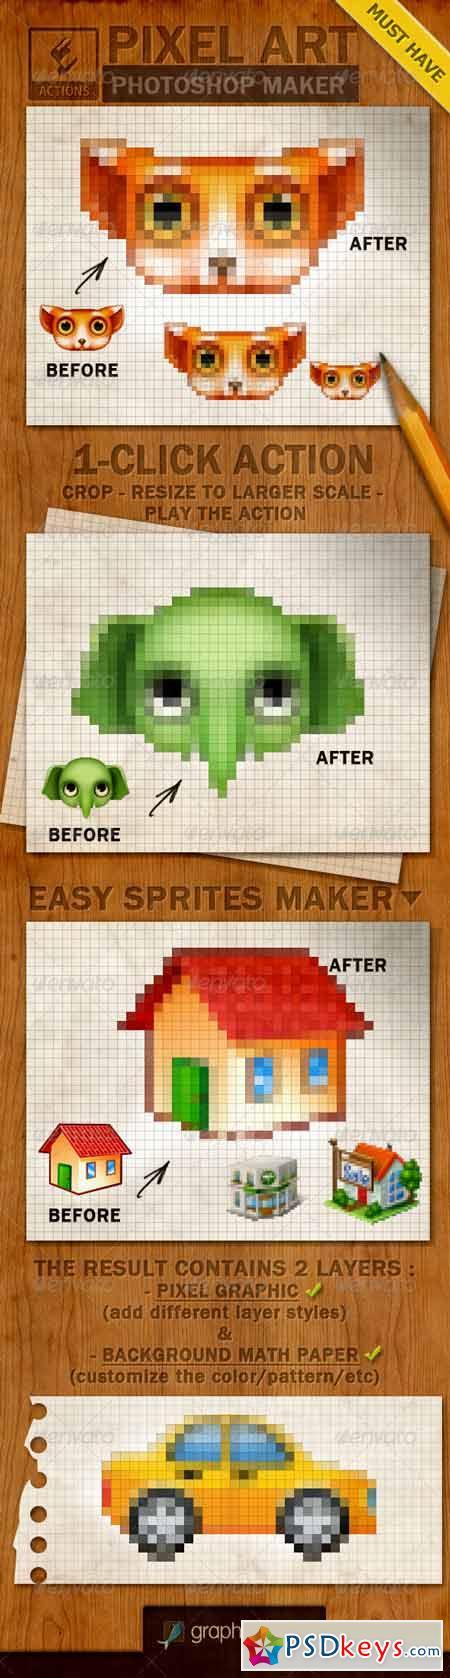 Pixel Art Creator Photoshop Action 4069527